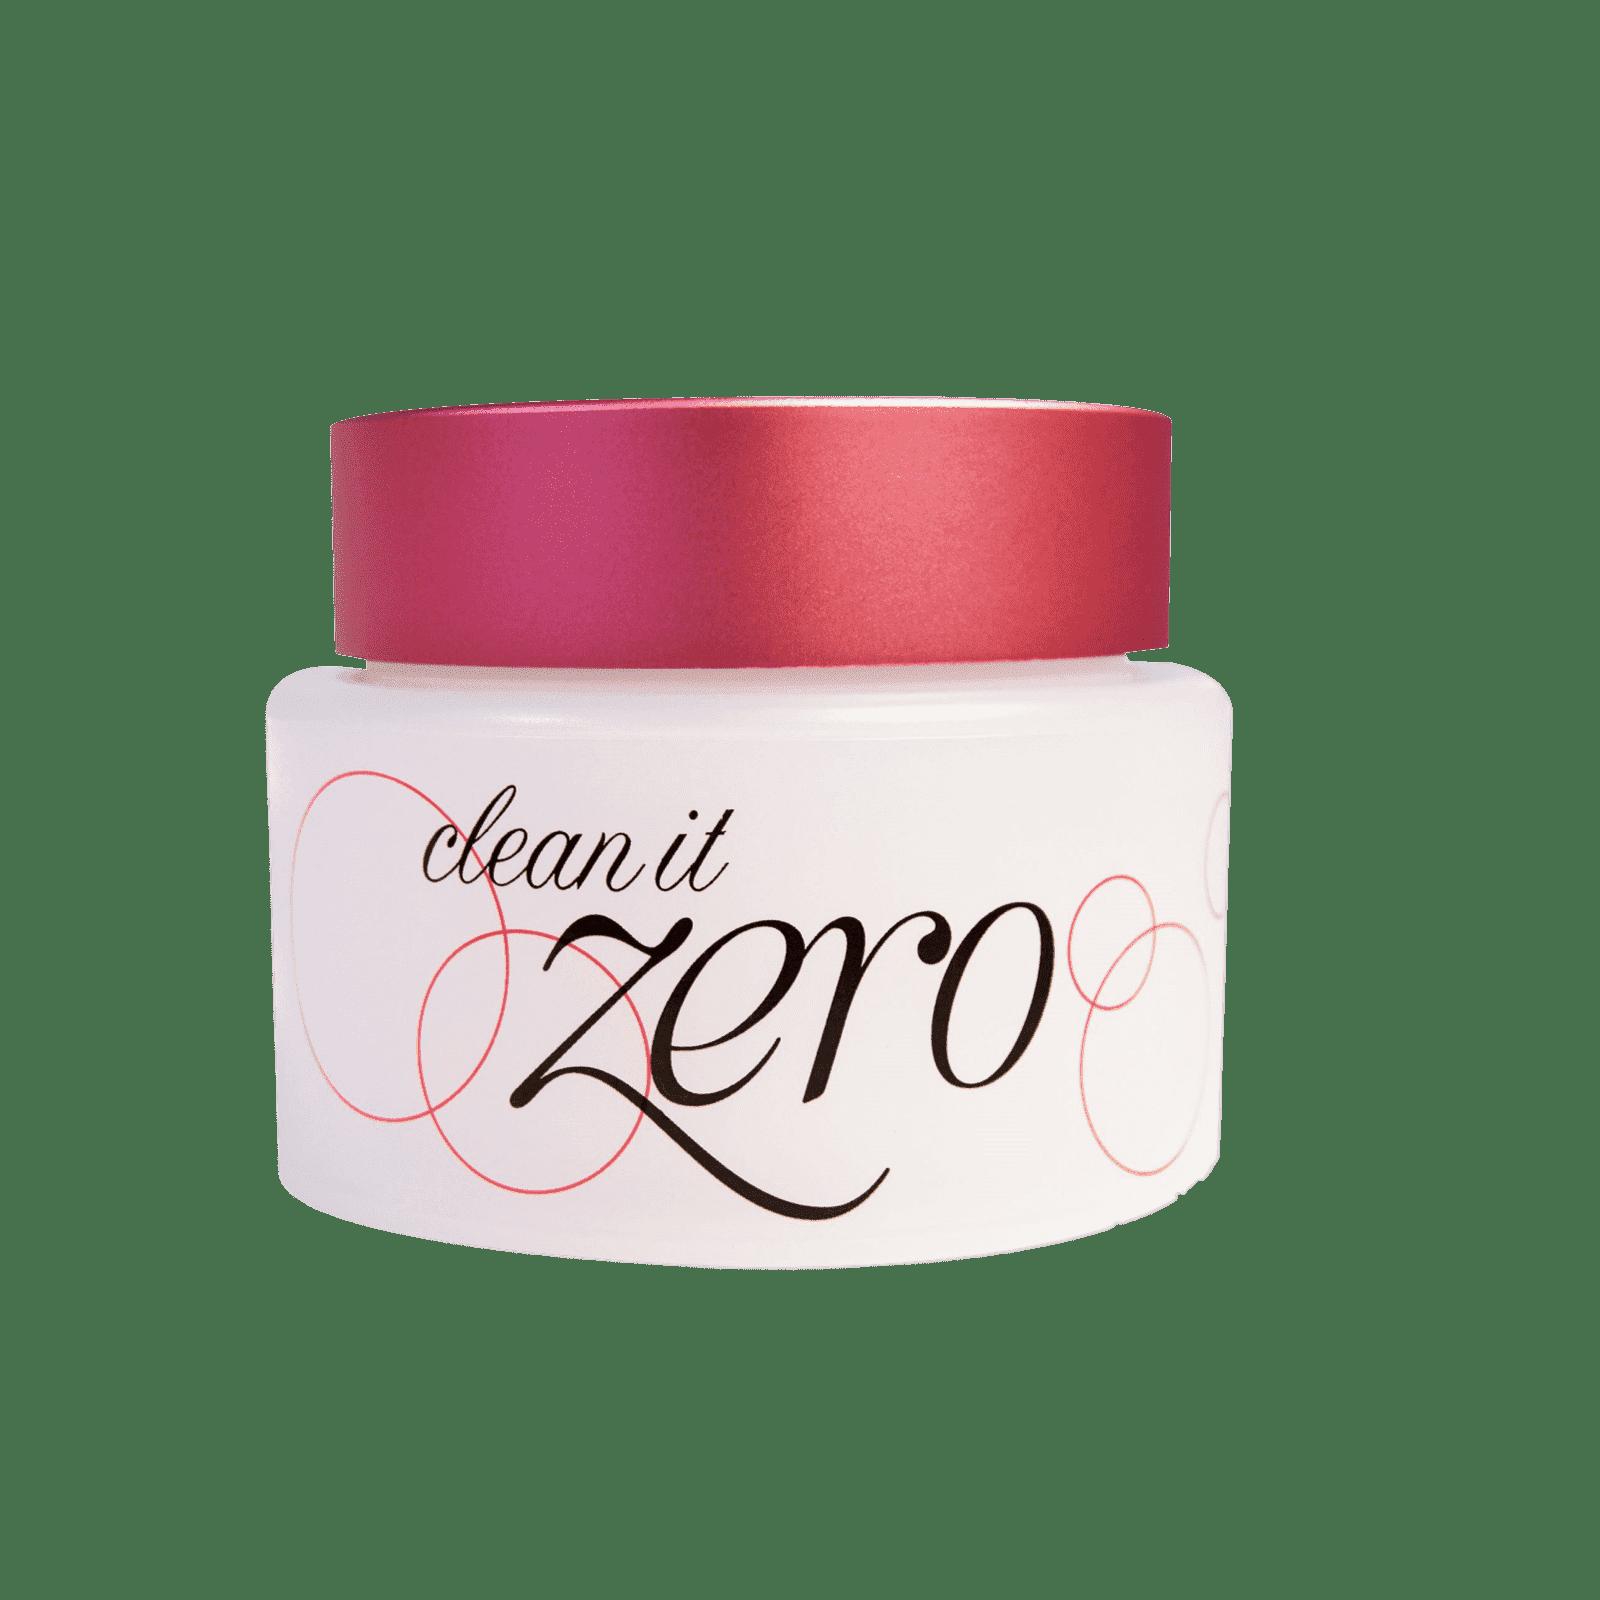 Banila-Clean-It-Zero-Cleanser_clipped_rev_1-min.png